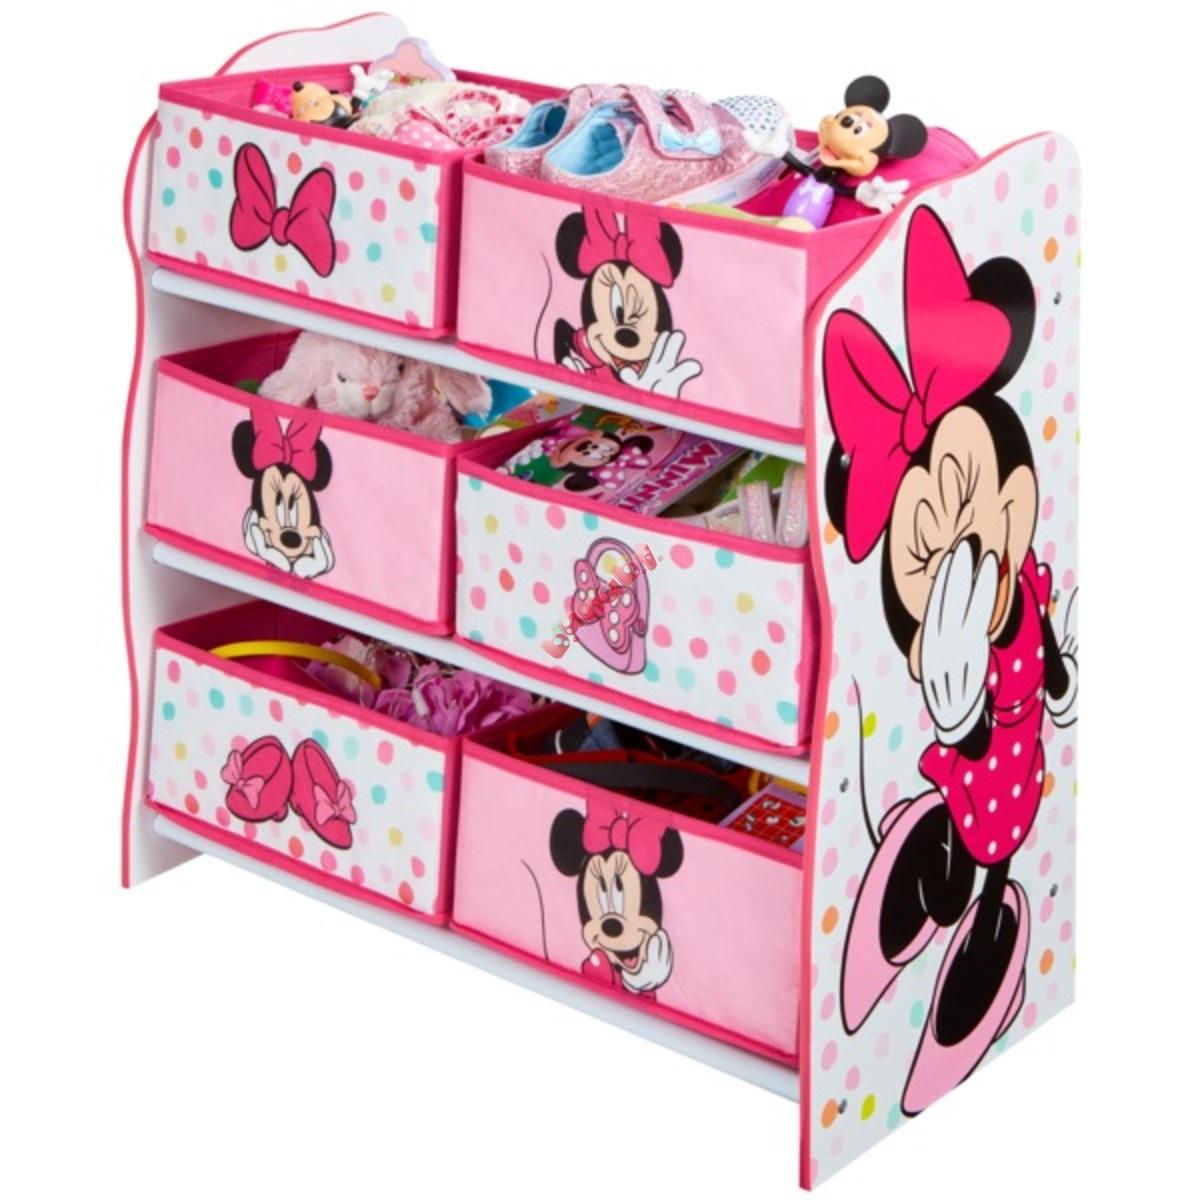 Minnie Mouse Spielzeug Veranstalter banaby.at